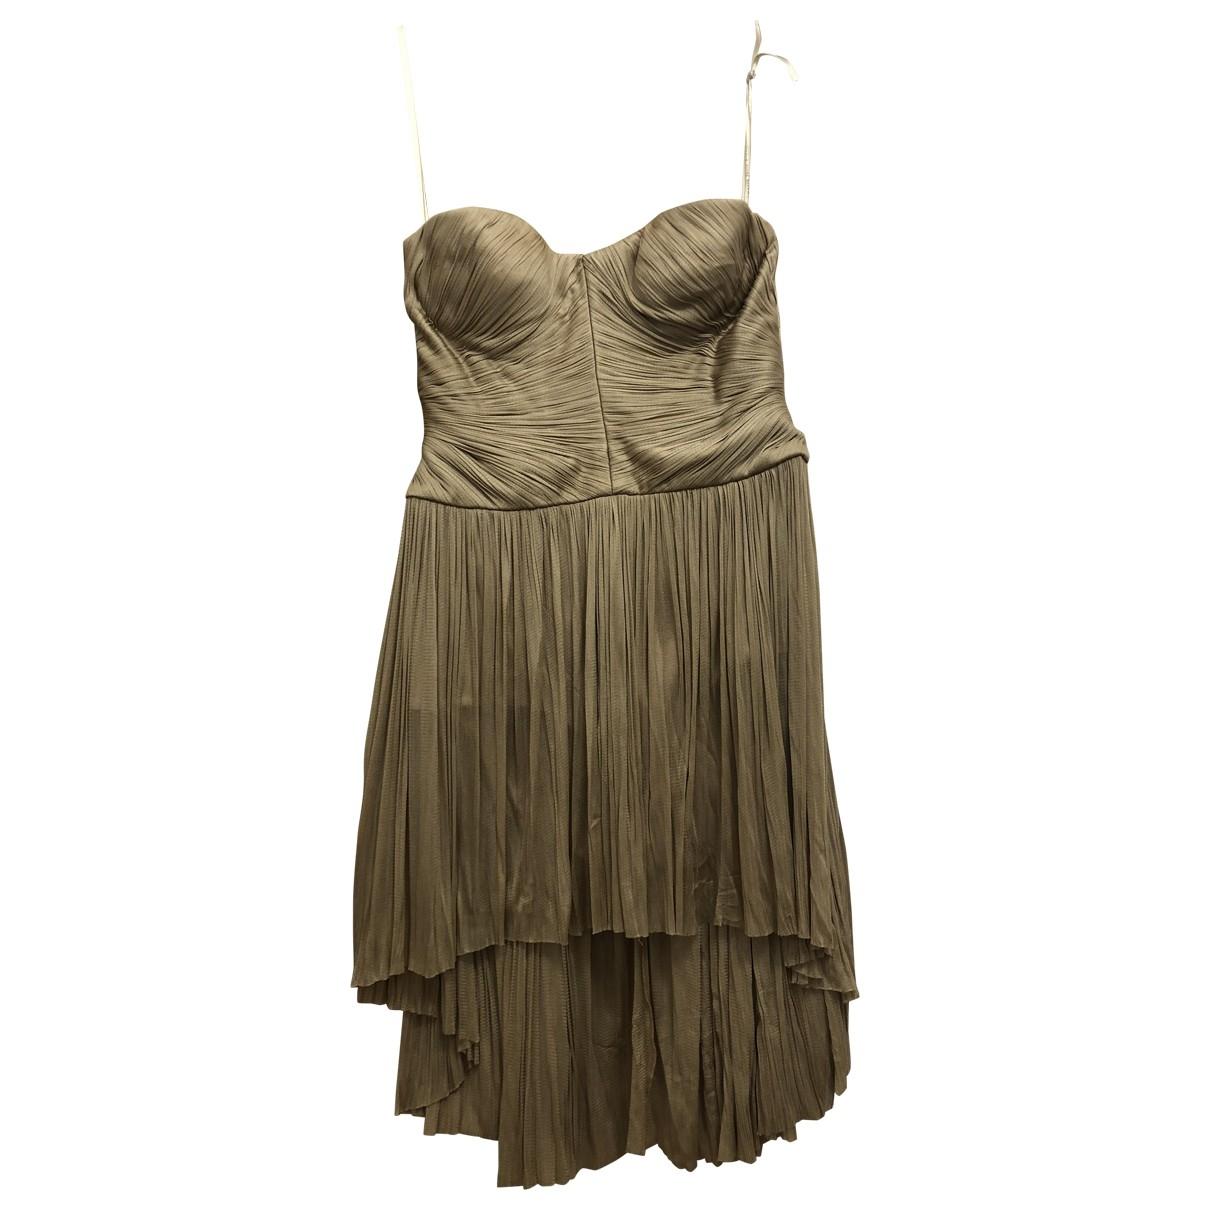 Maria Lucia Hohan \N Beige Silk dress for Women 38 FR